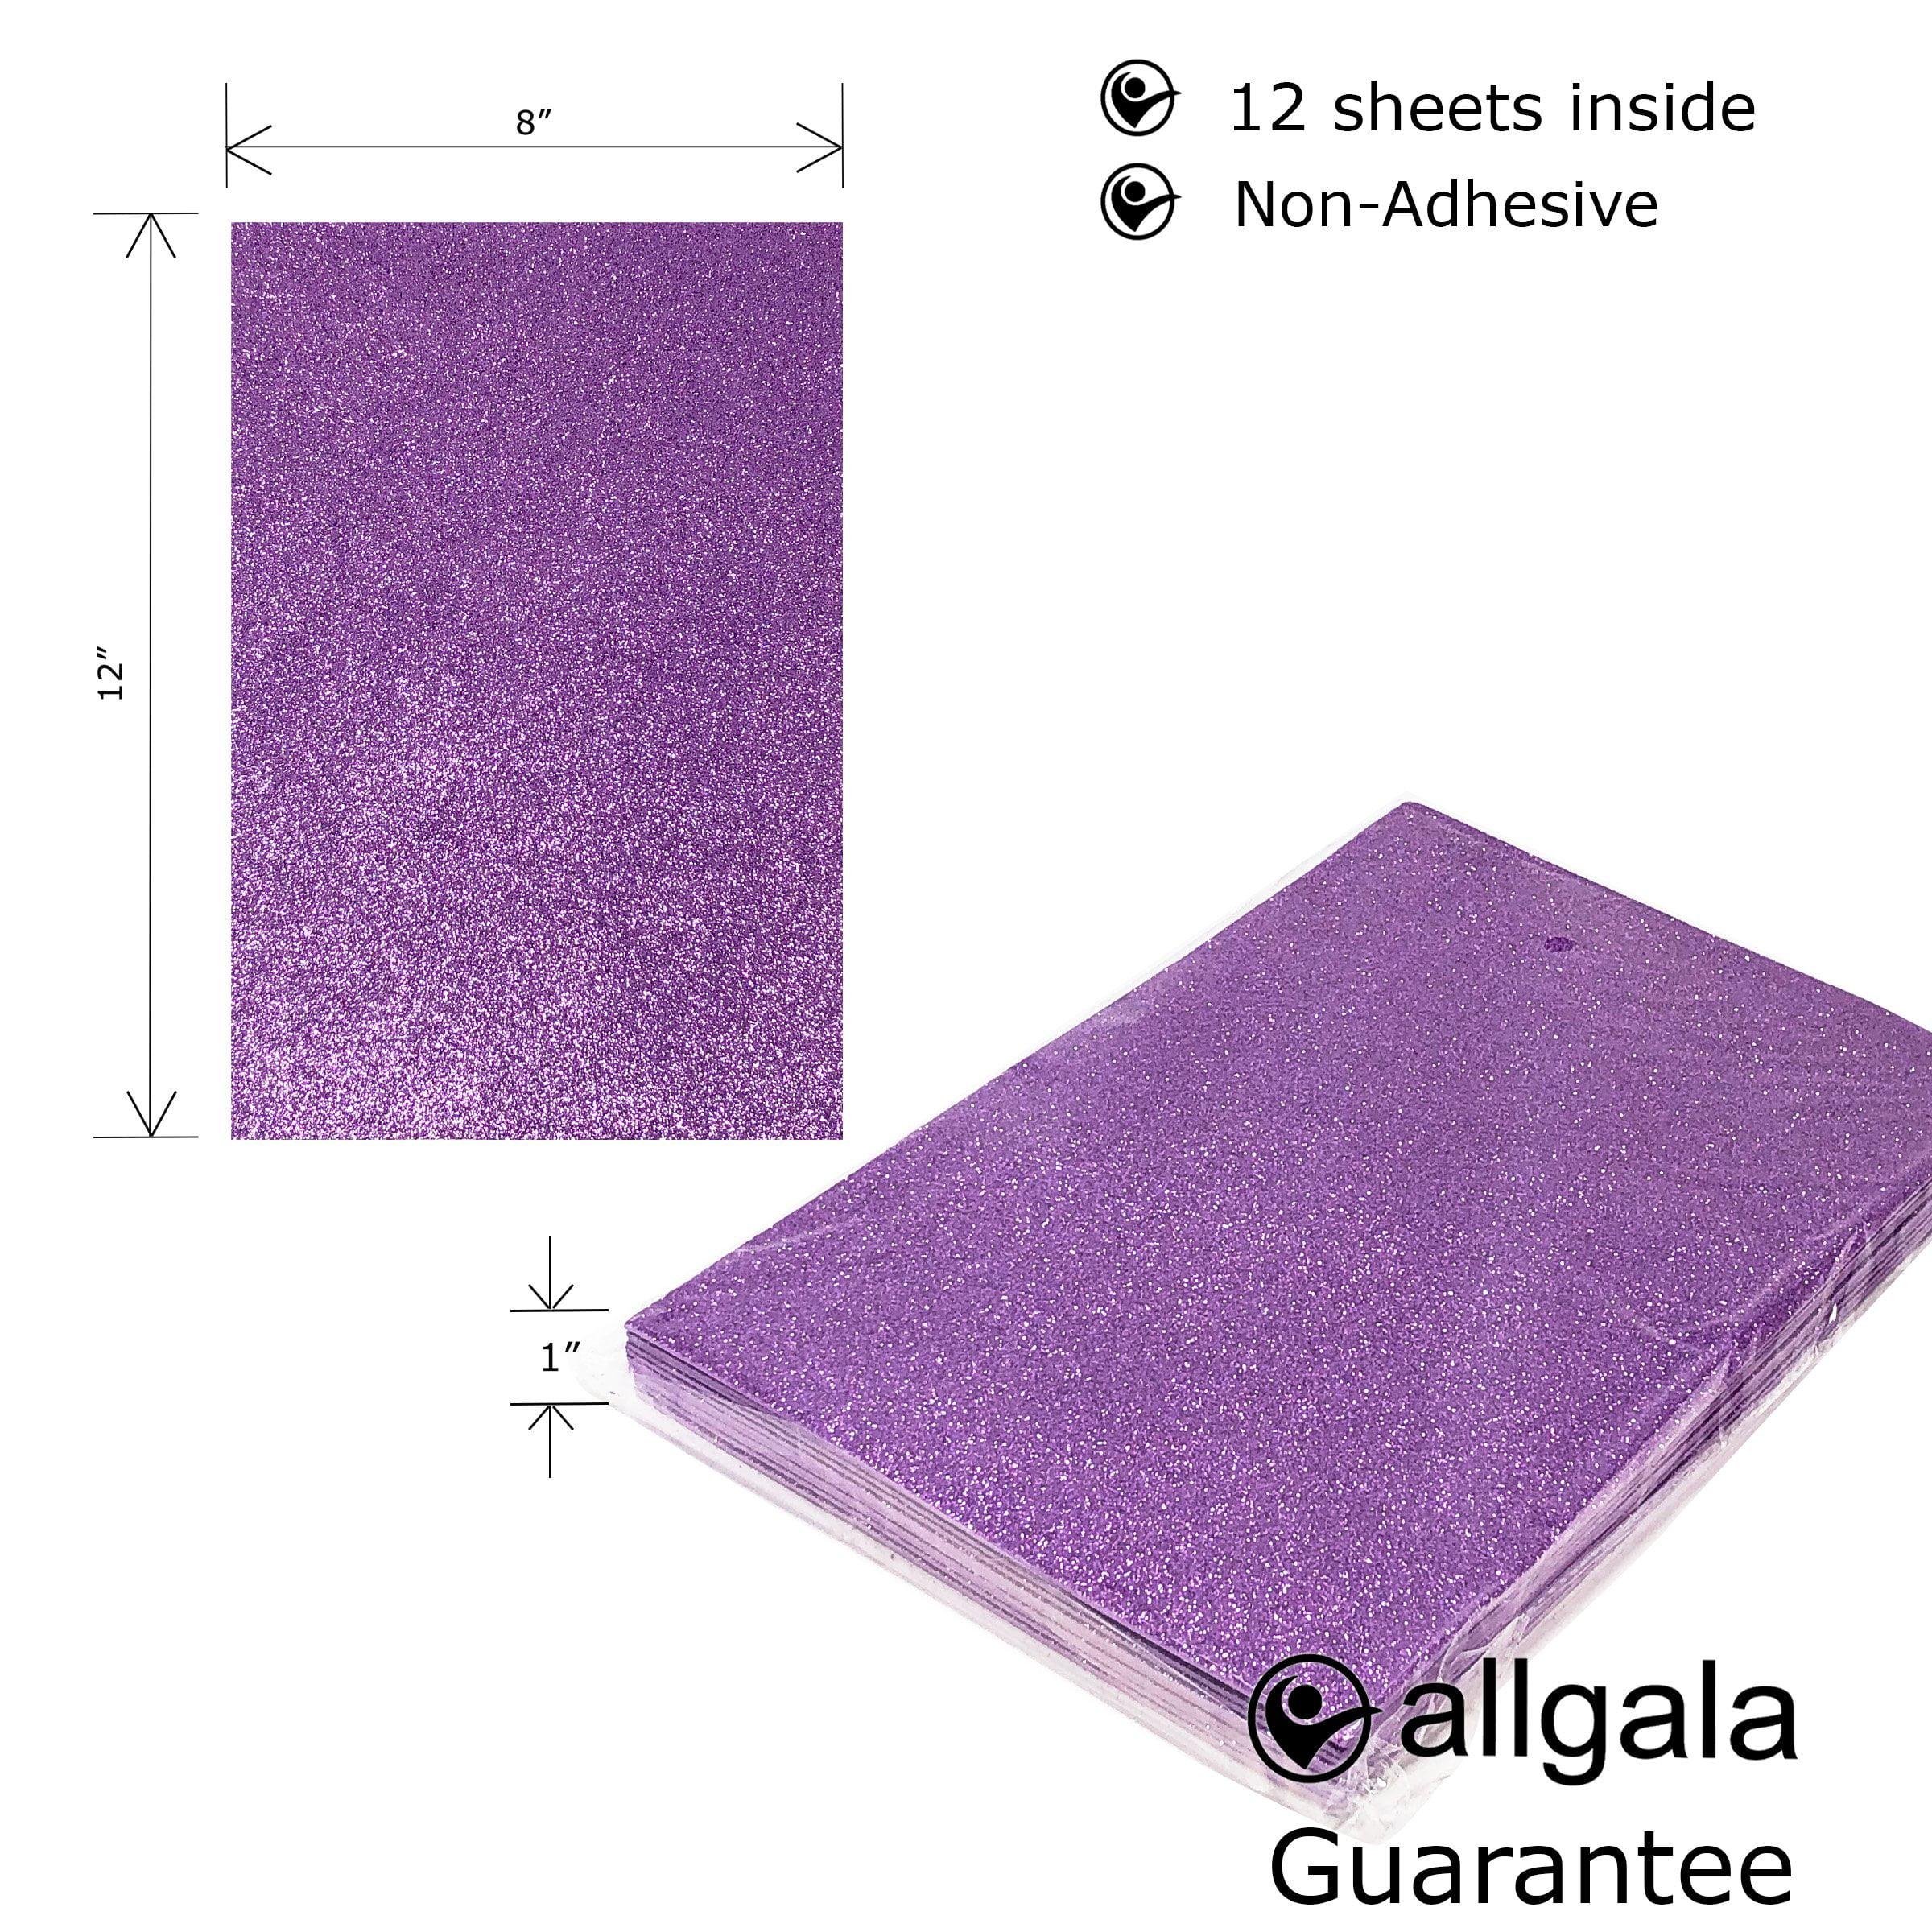 Allgala 12 Pack Self-Adhesive Glitter EVA Foam Paper 8 x 12inch Sheets-Black-CF85210